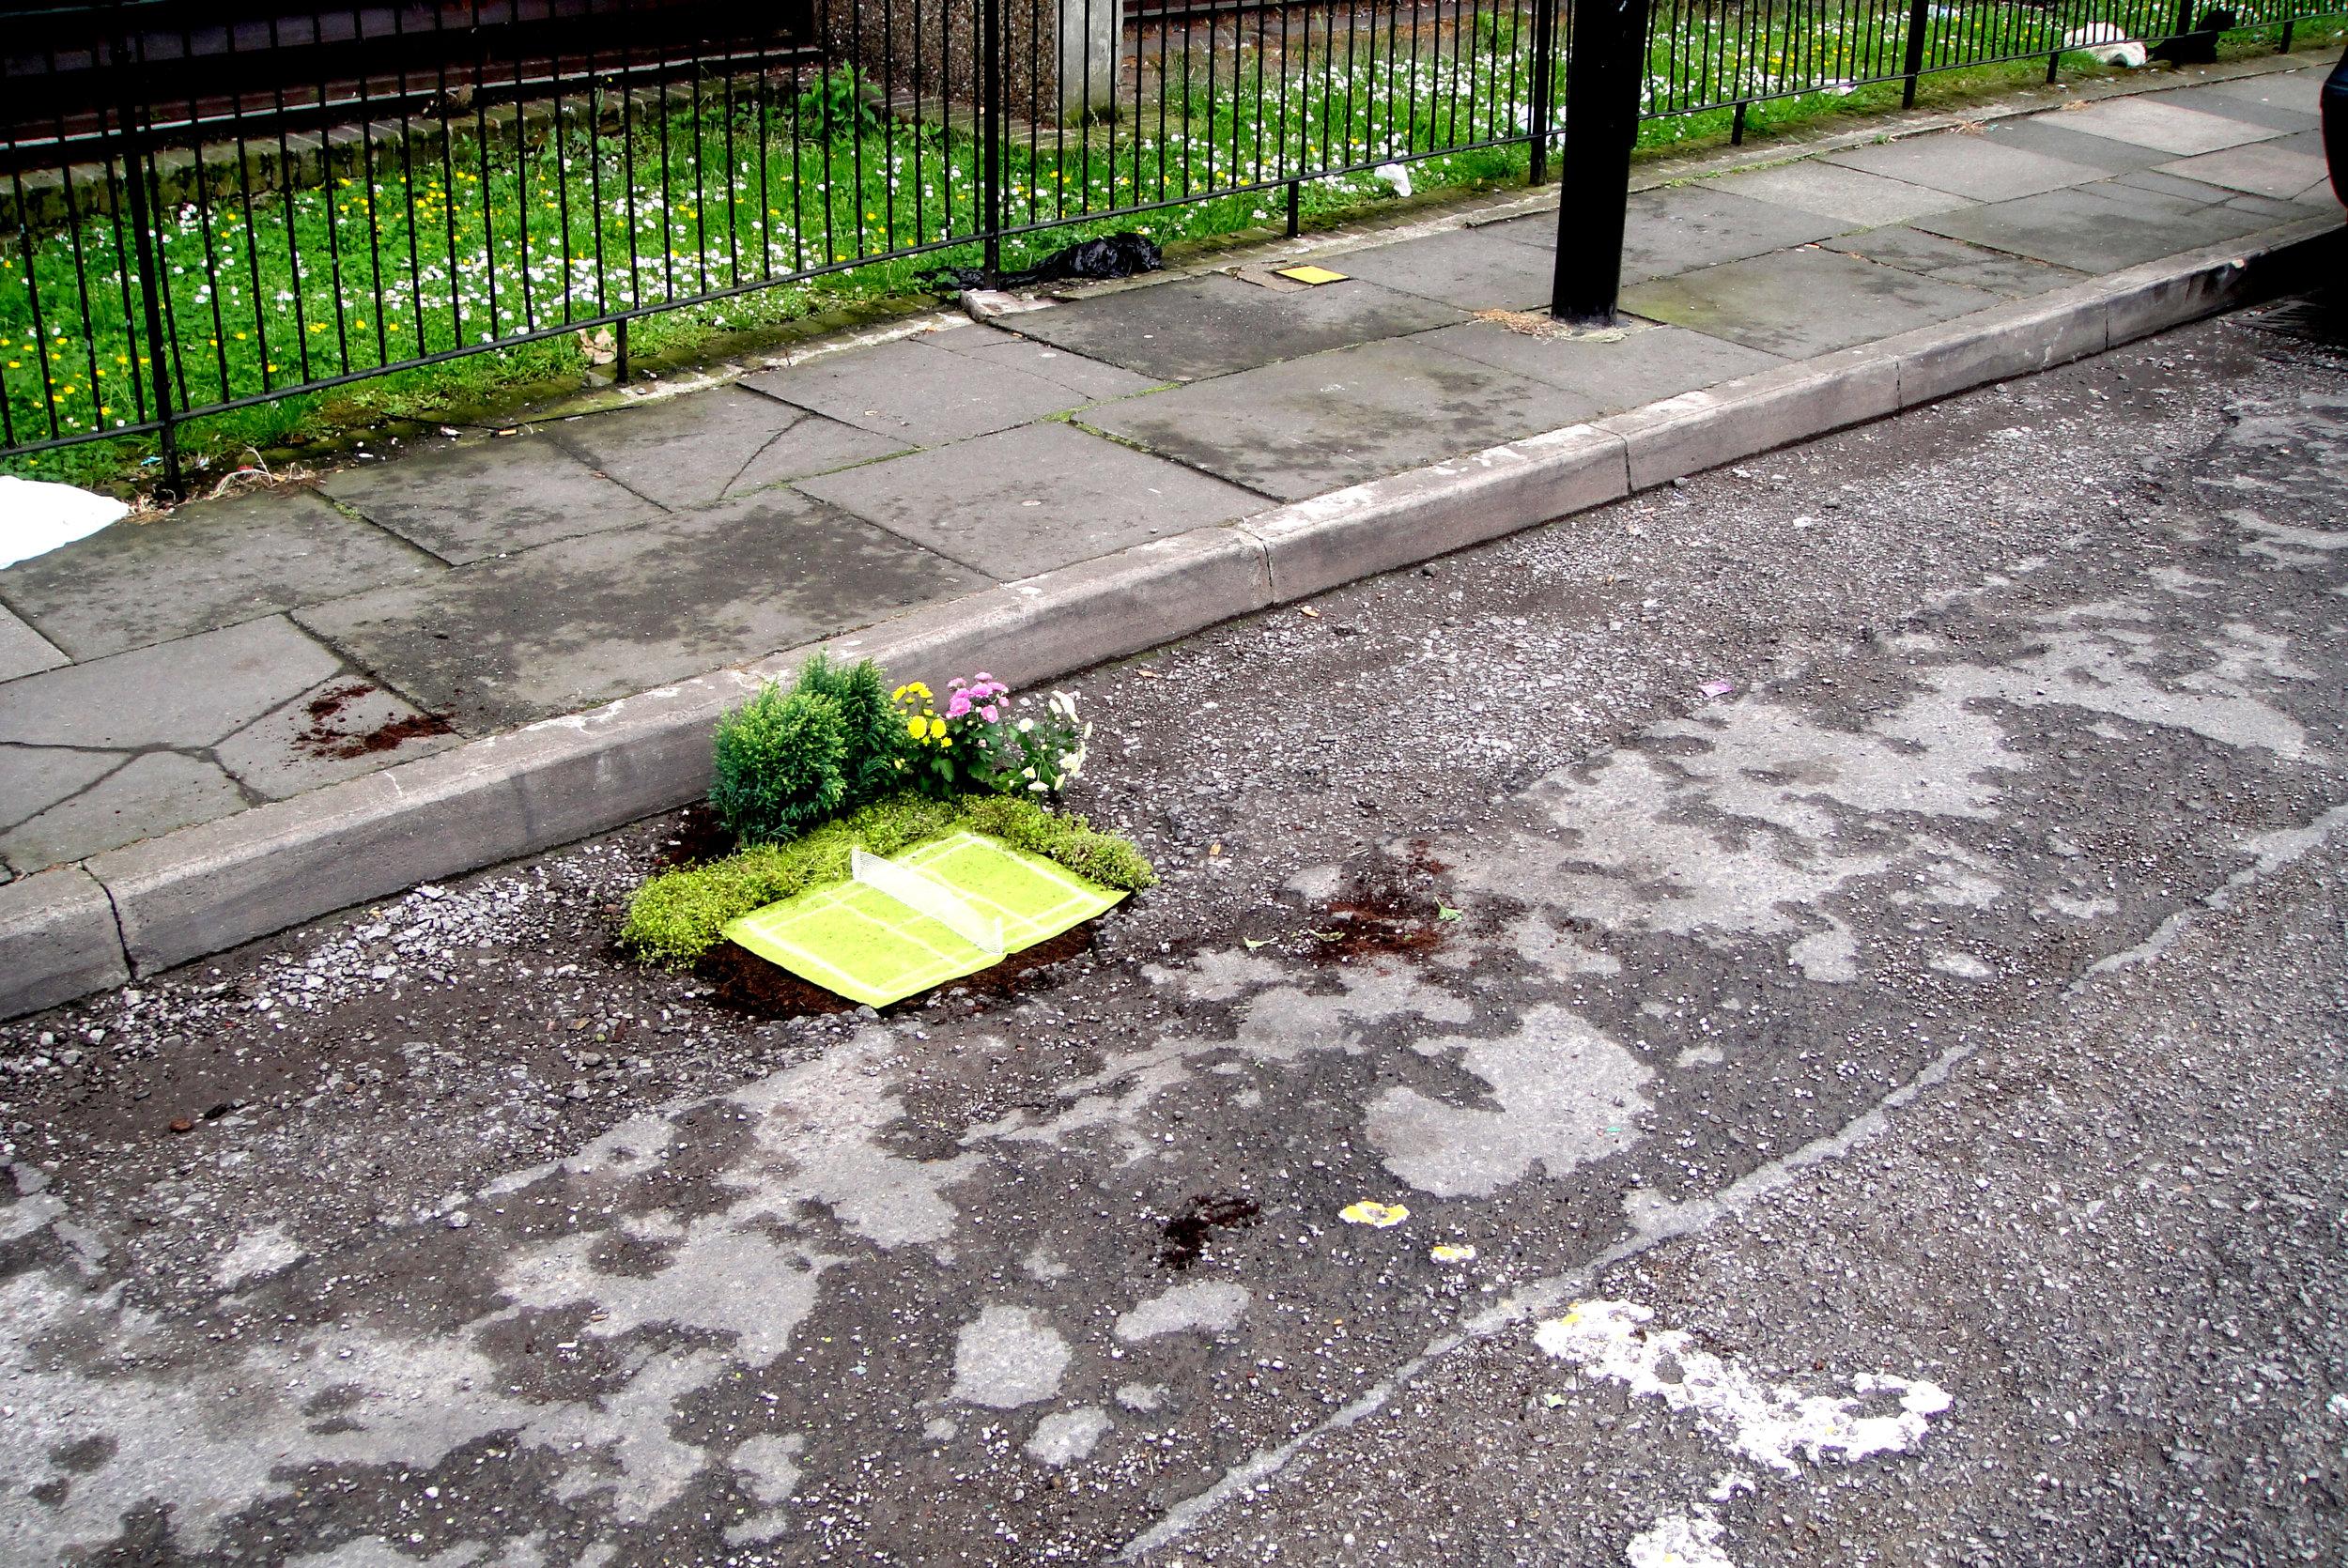 wimbledon tennis London pothole garden